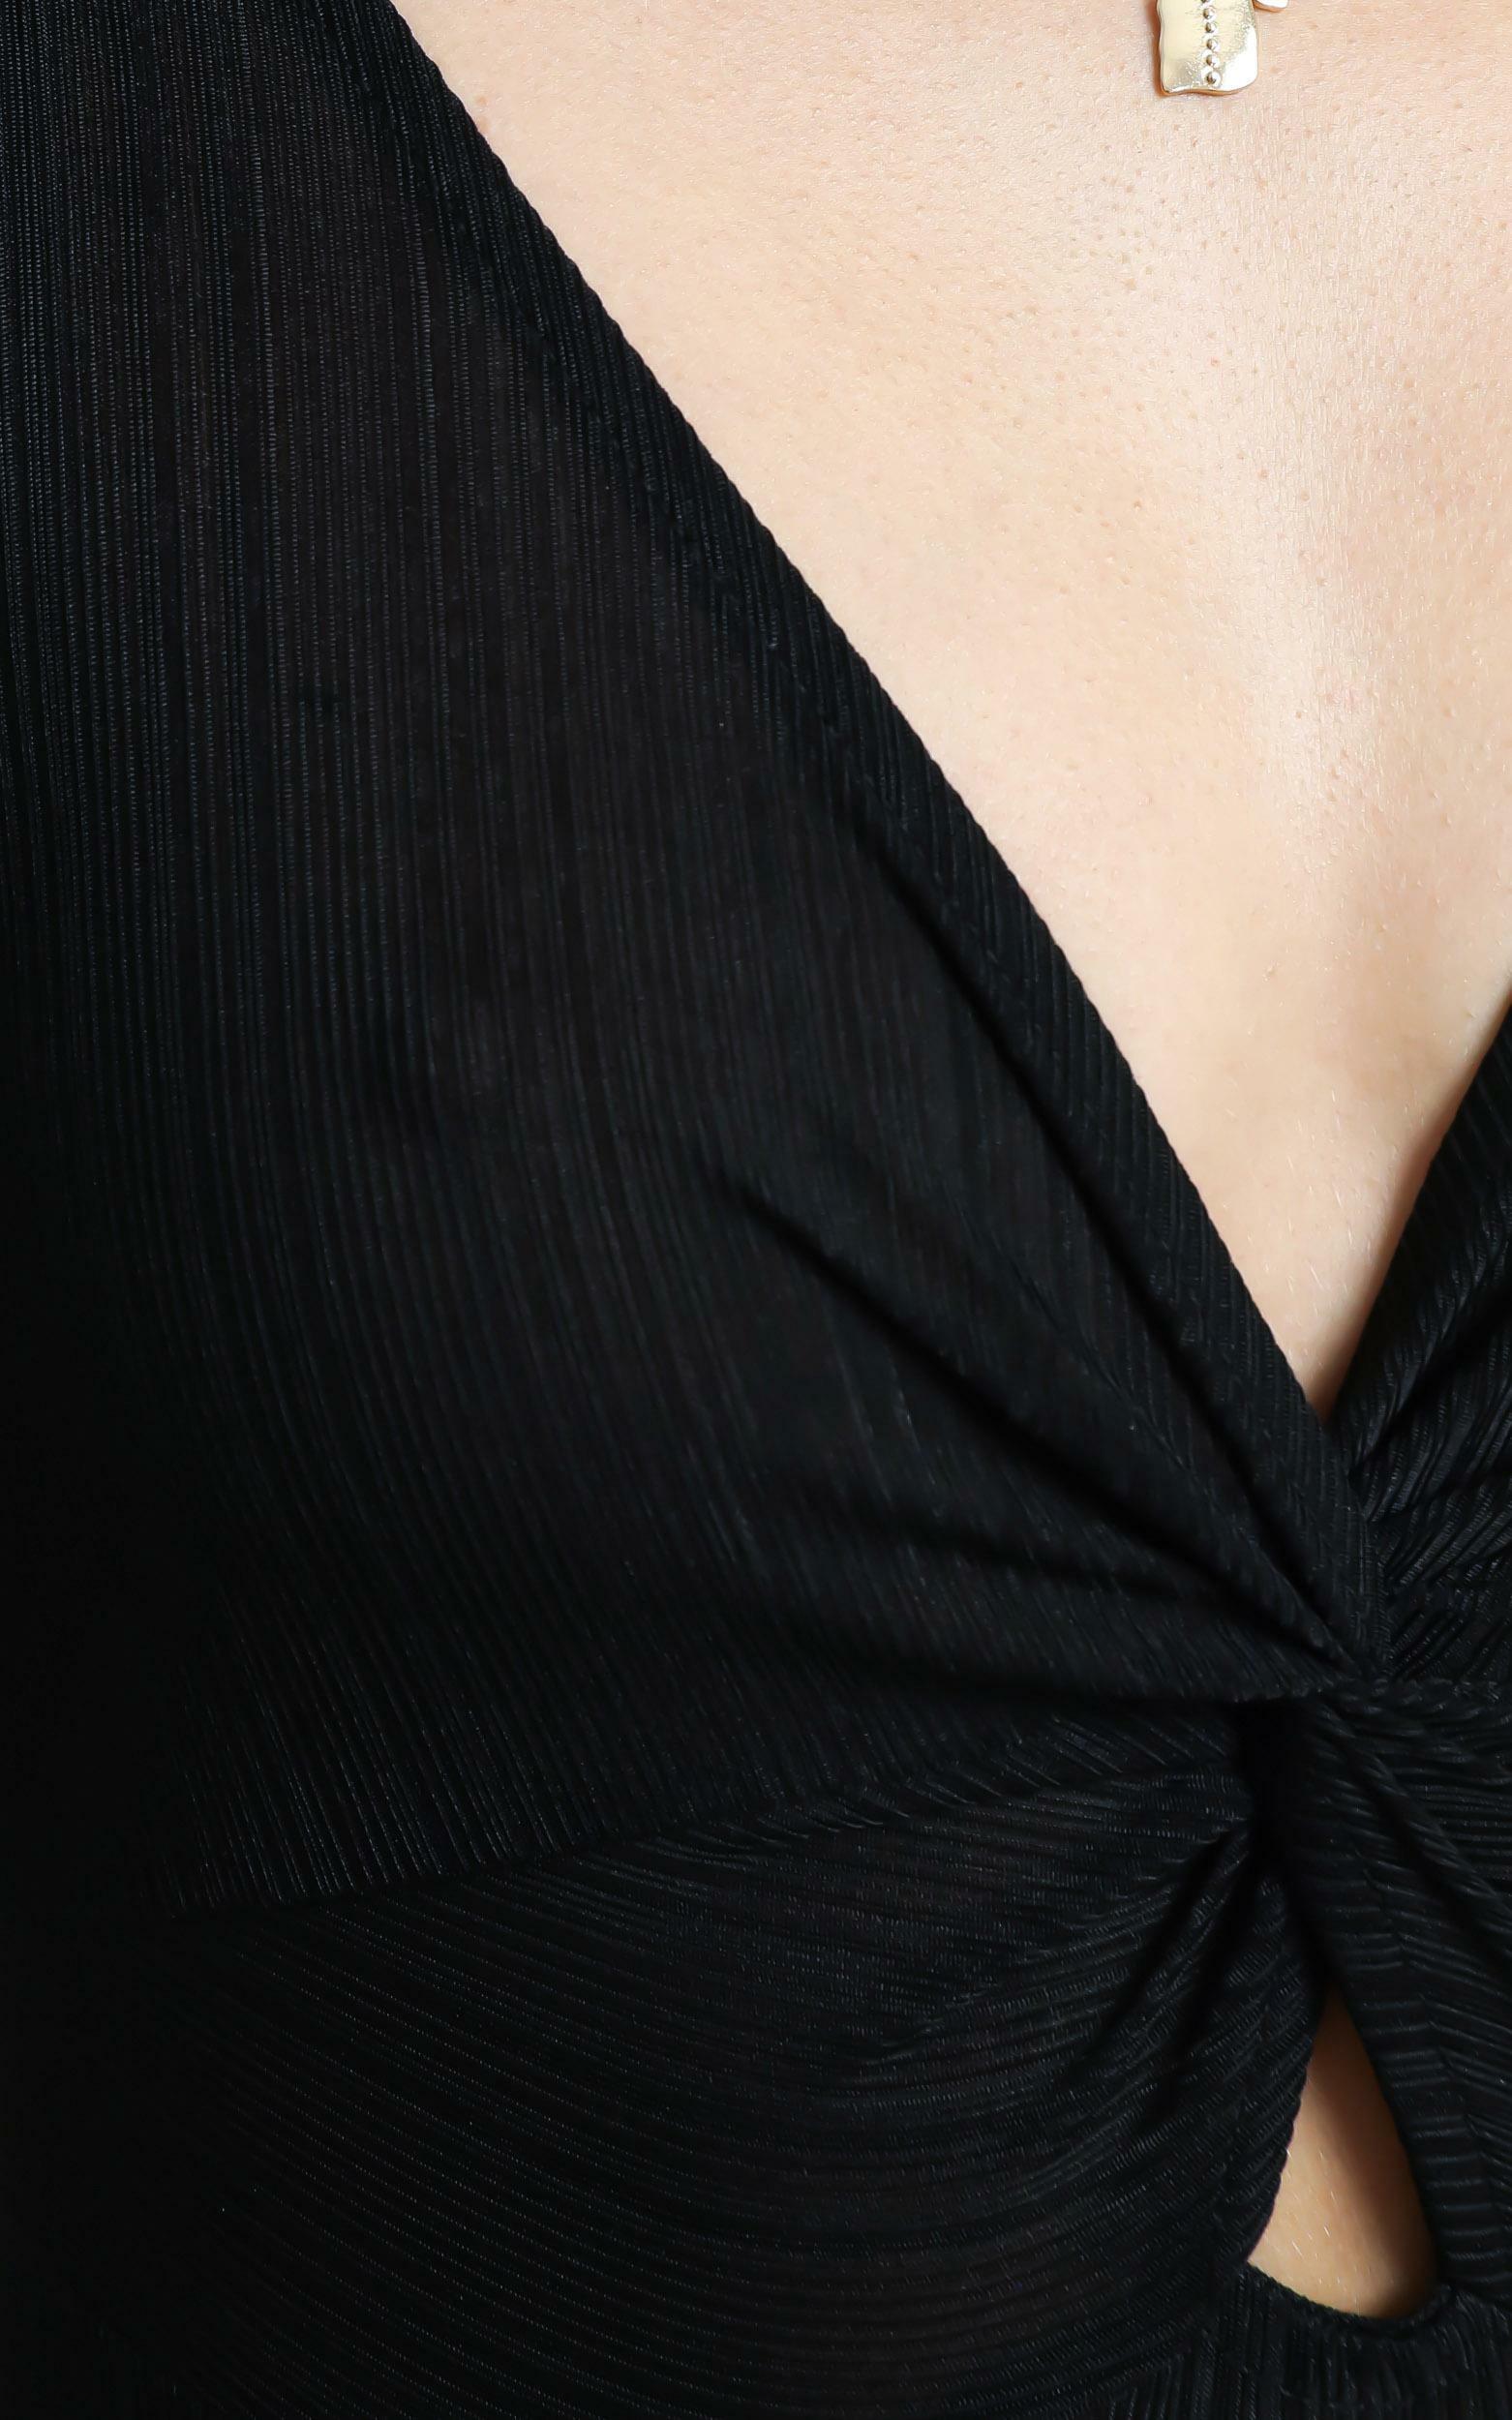 Pena Bodysuit in Black - 8 (S), Black, hi-res image number null